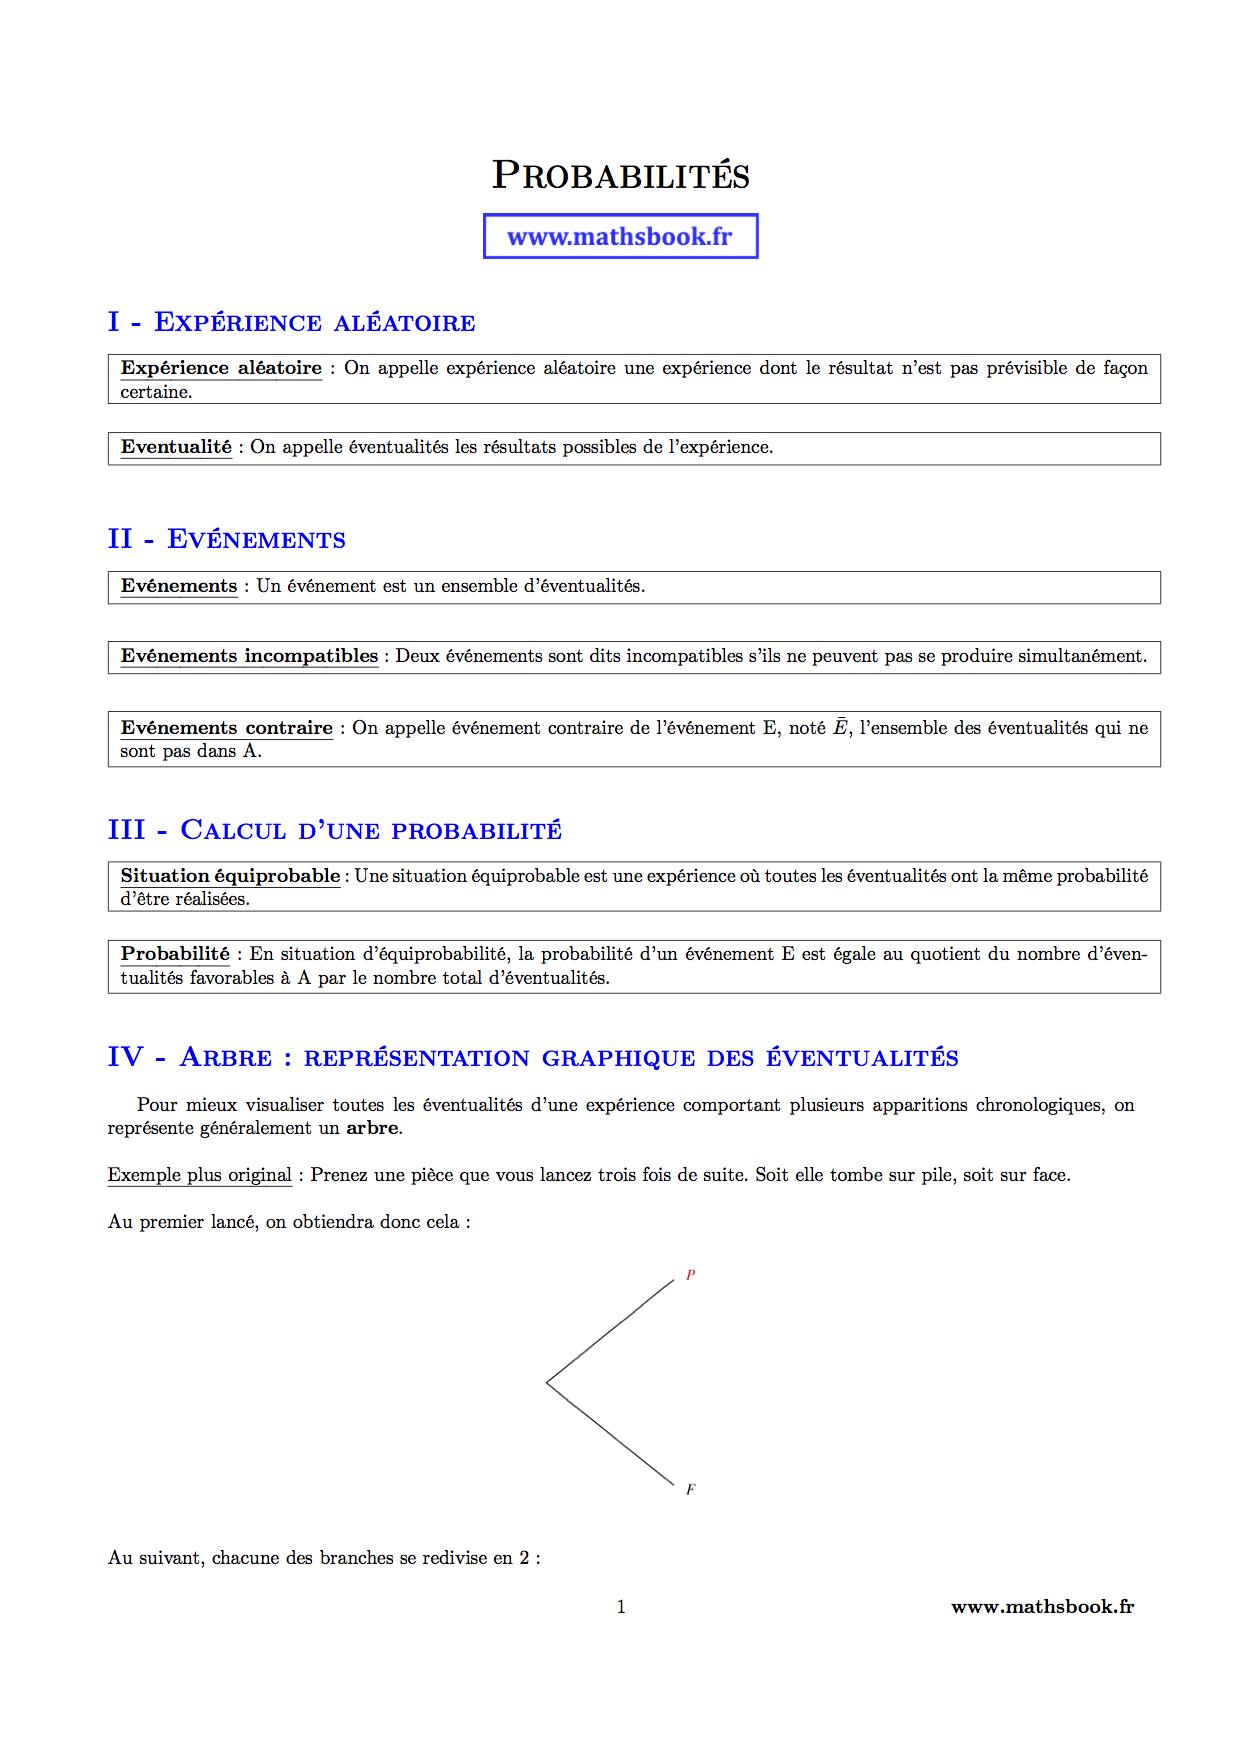 Fiche revision brevet math pdf